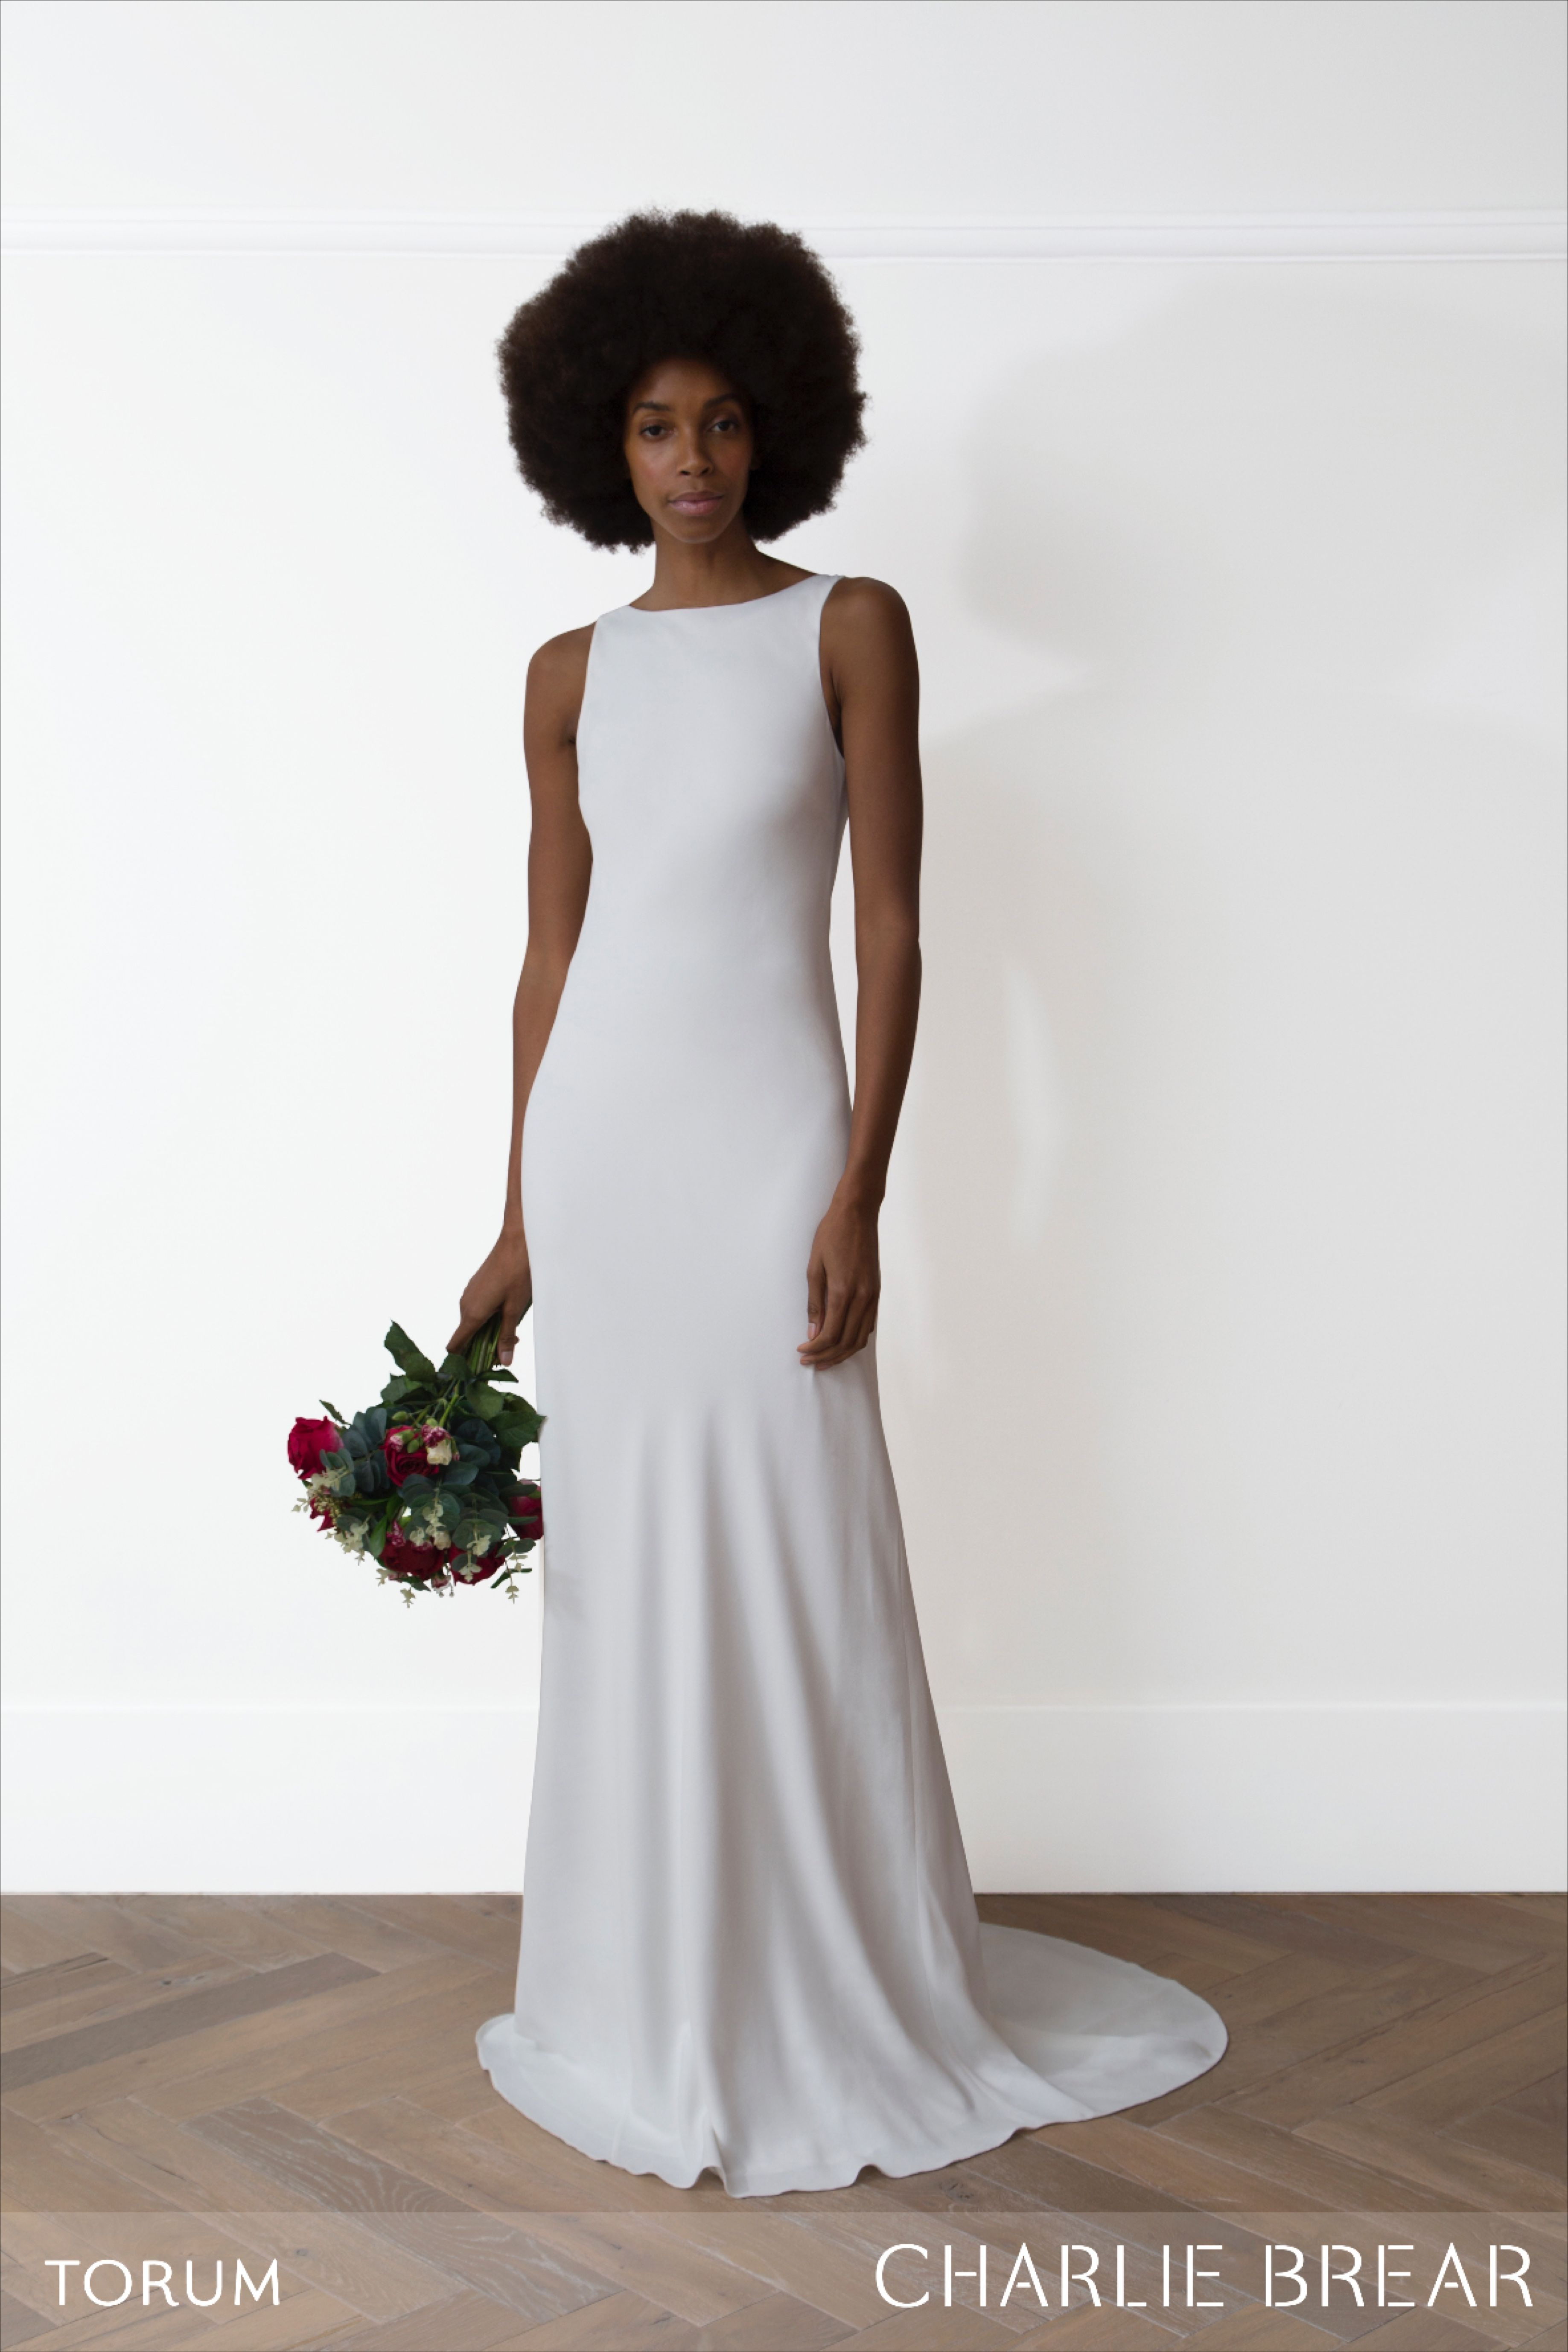 Charlie Brear Torum Dress At The White Closet Manchester Charlie Brear Wedding Dress Column Wedding Dress Bridal Dresses Online [ 5510 x 3674 Pixel ]